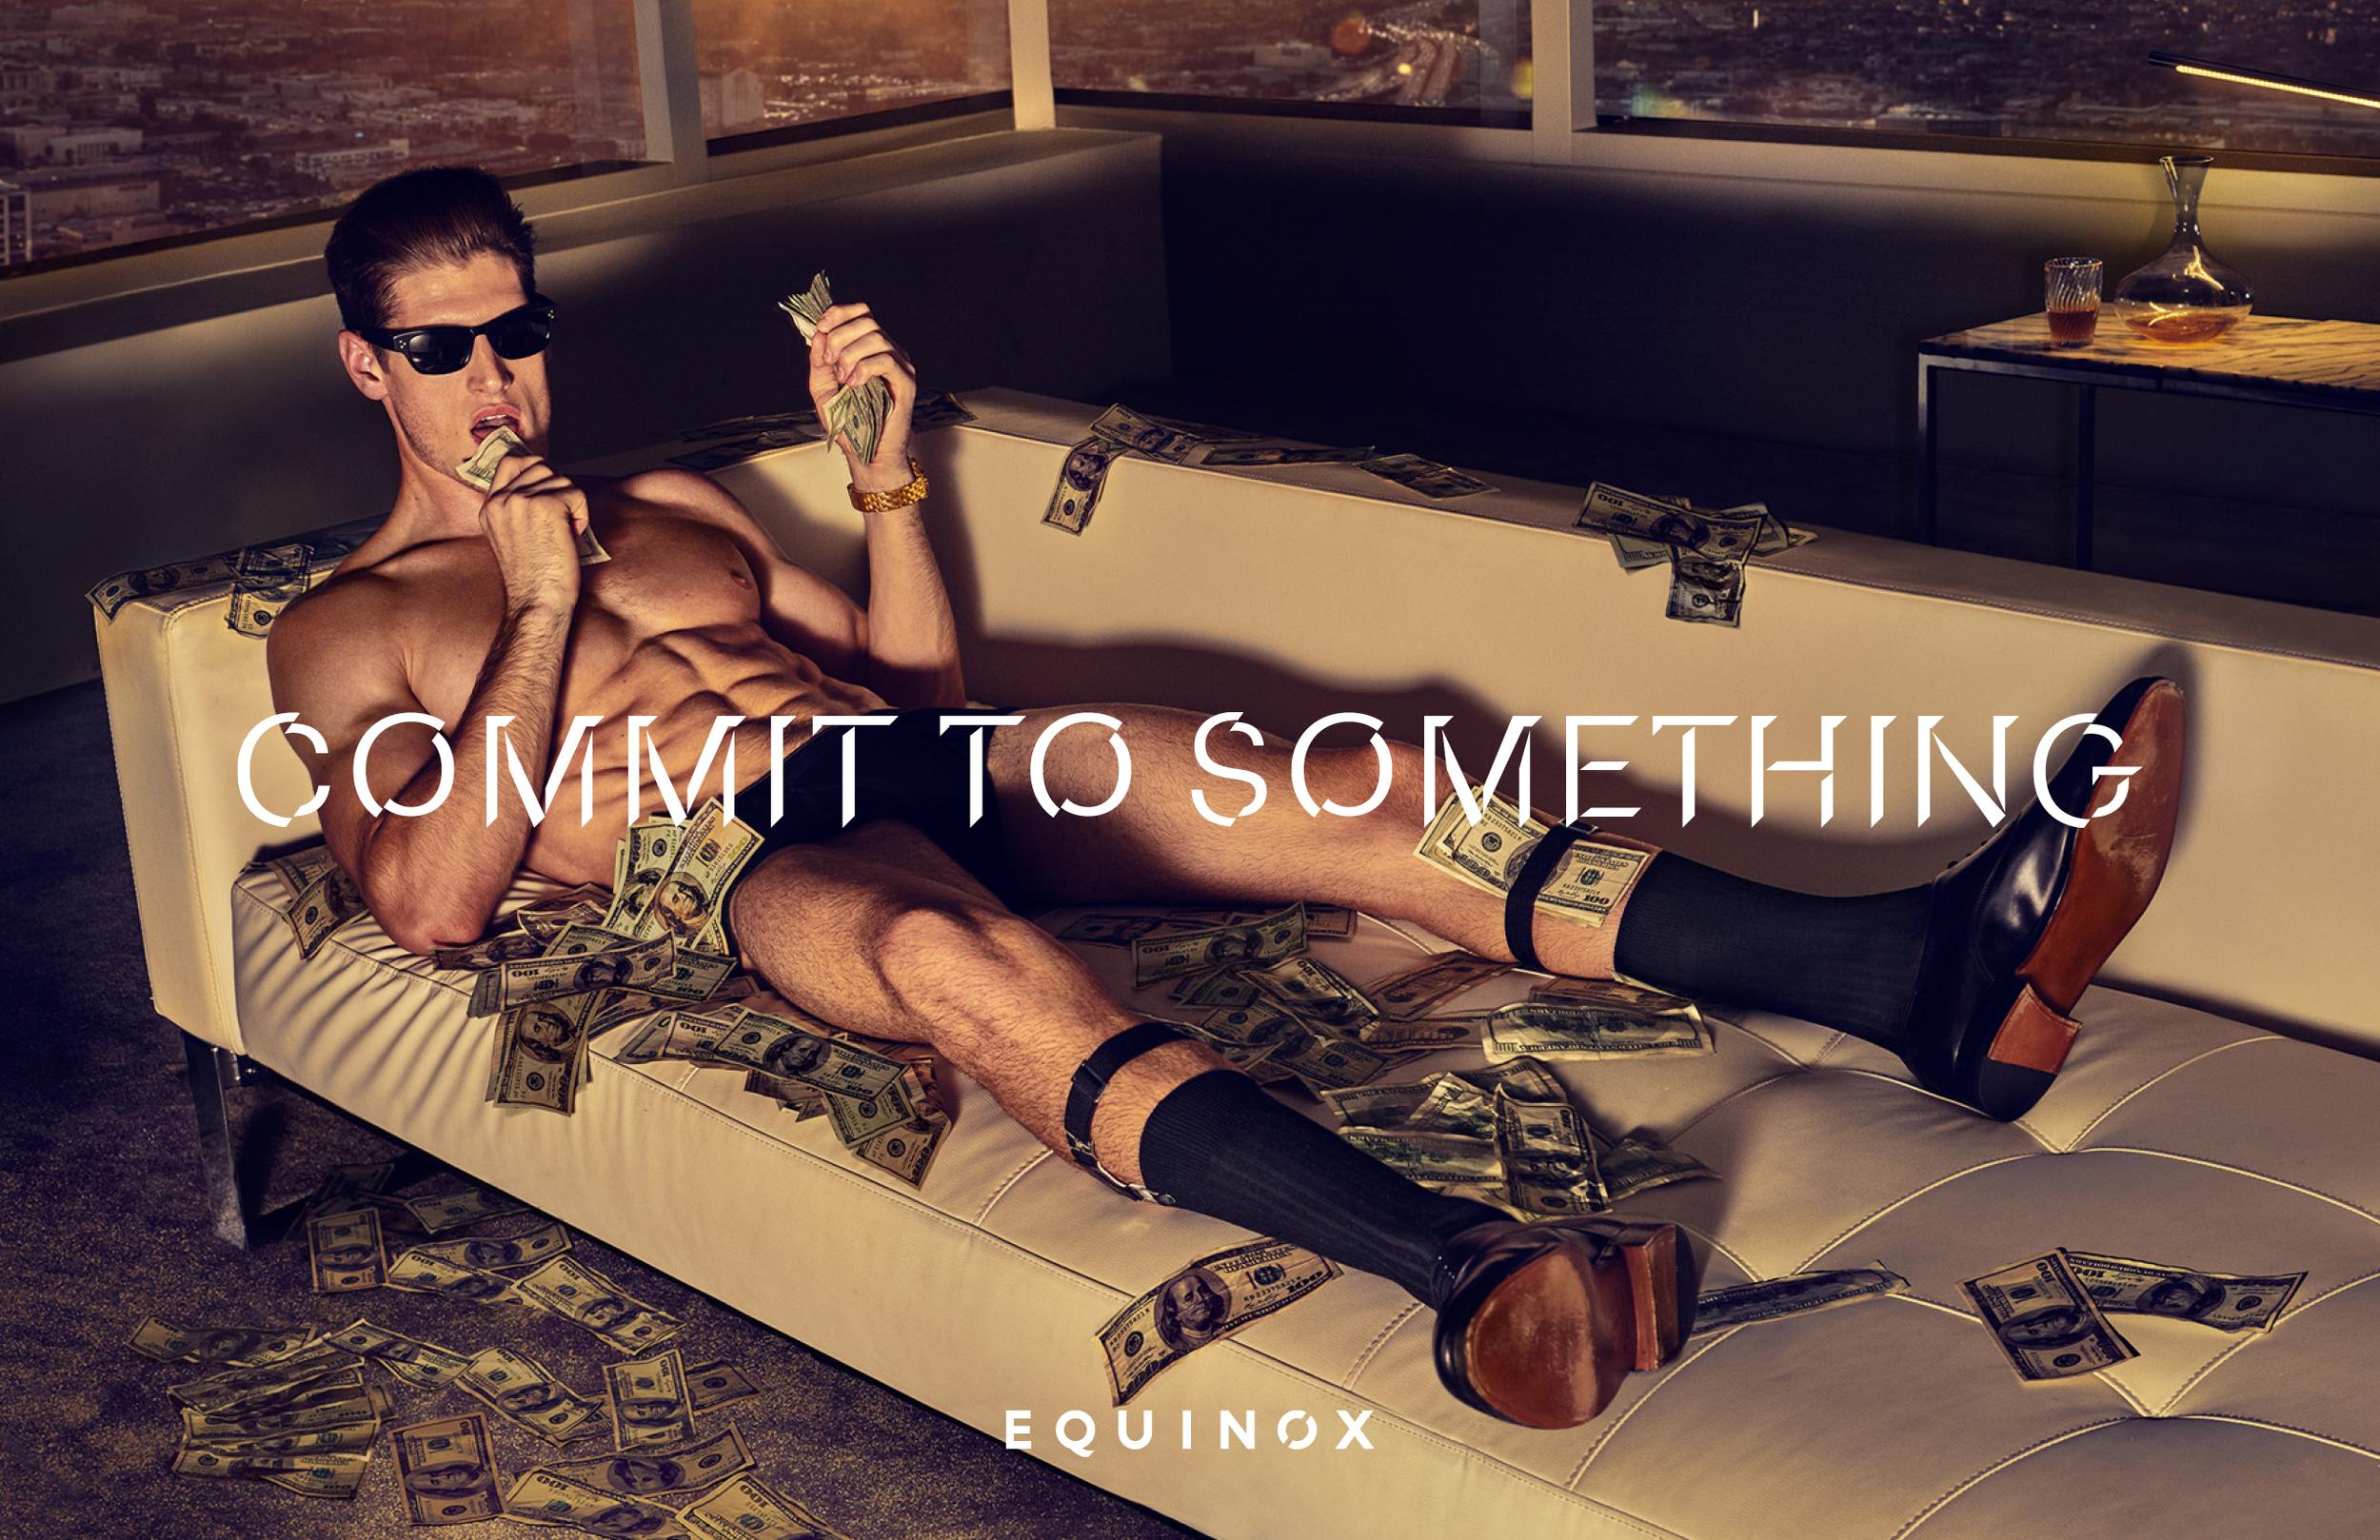 CommitToSomething7.jpg